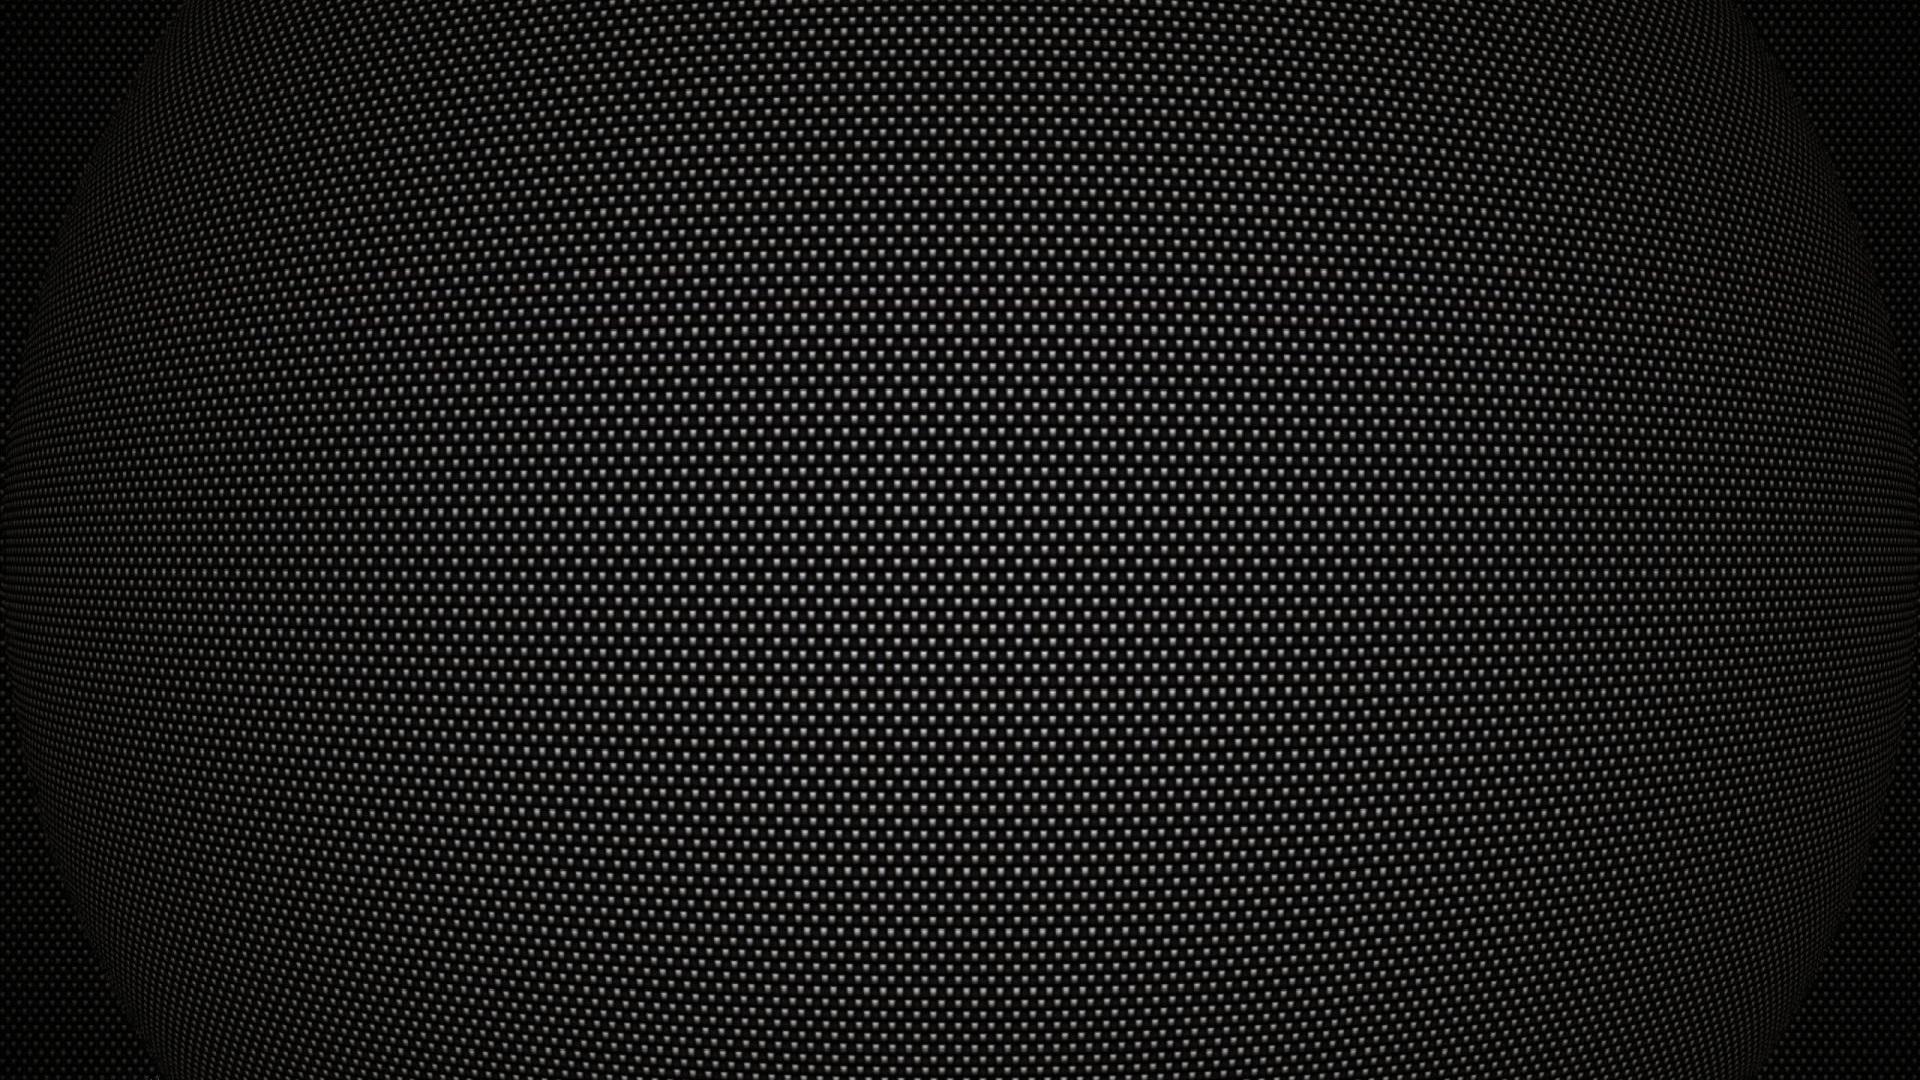 Black Wallpapers High Resolution: Plain Black Background Wallpaper 8 High Resolution